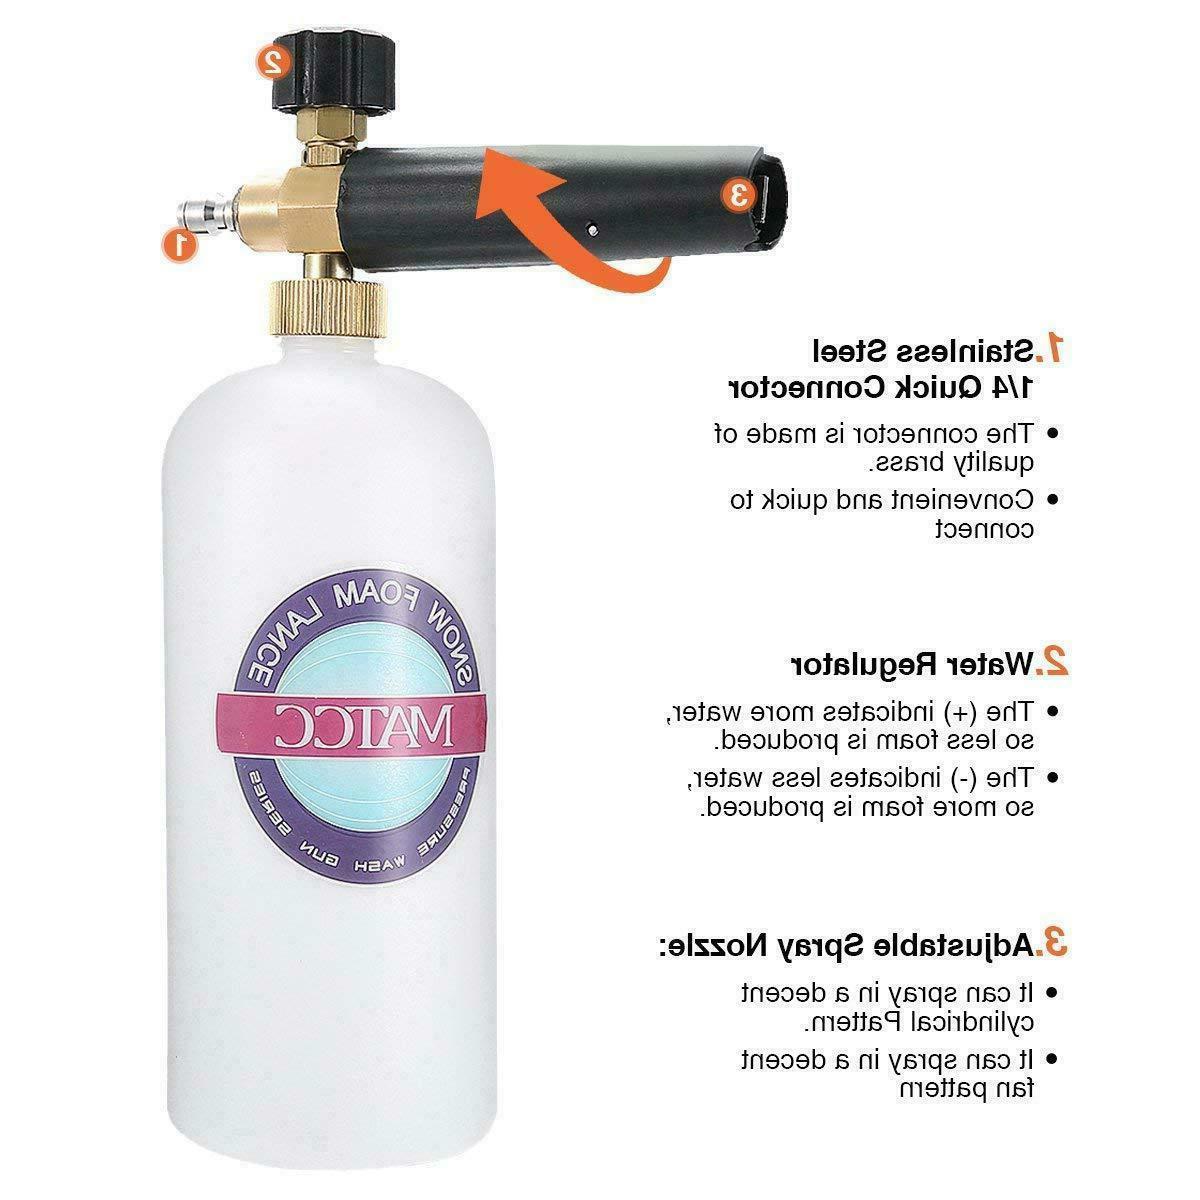 Soap Sprayer For Car Wash